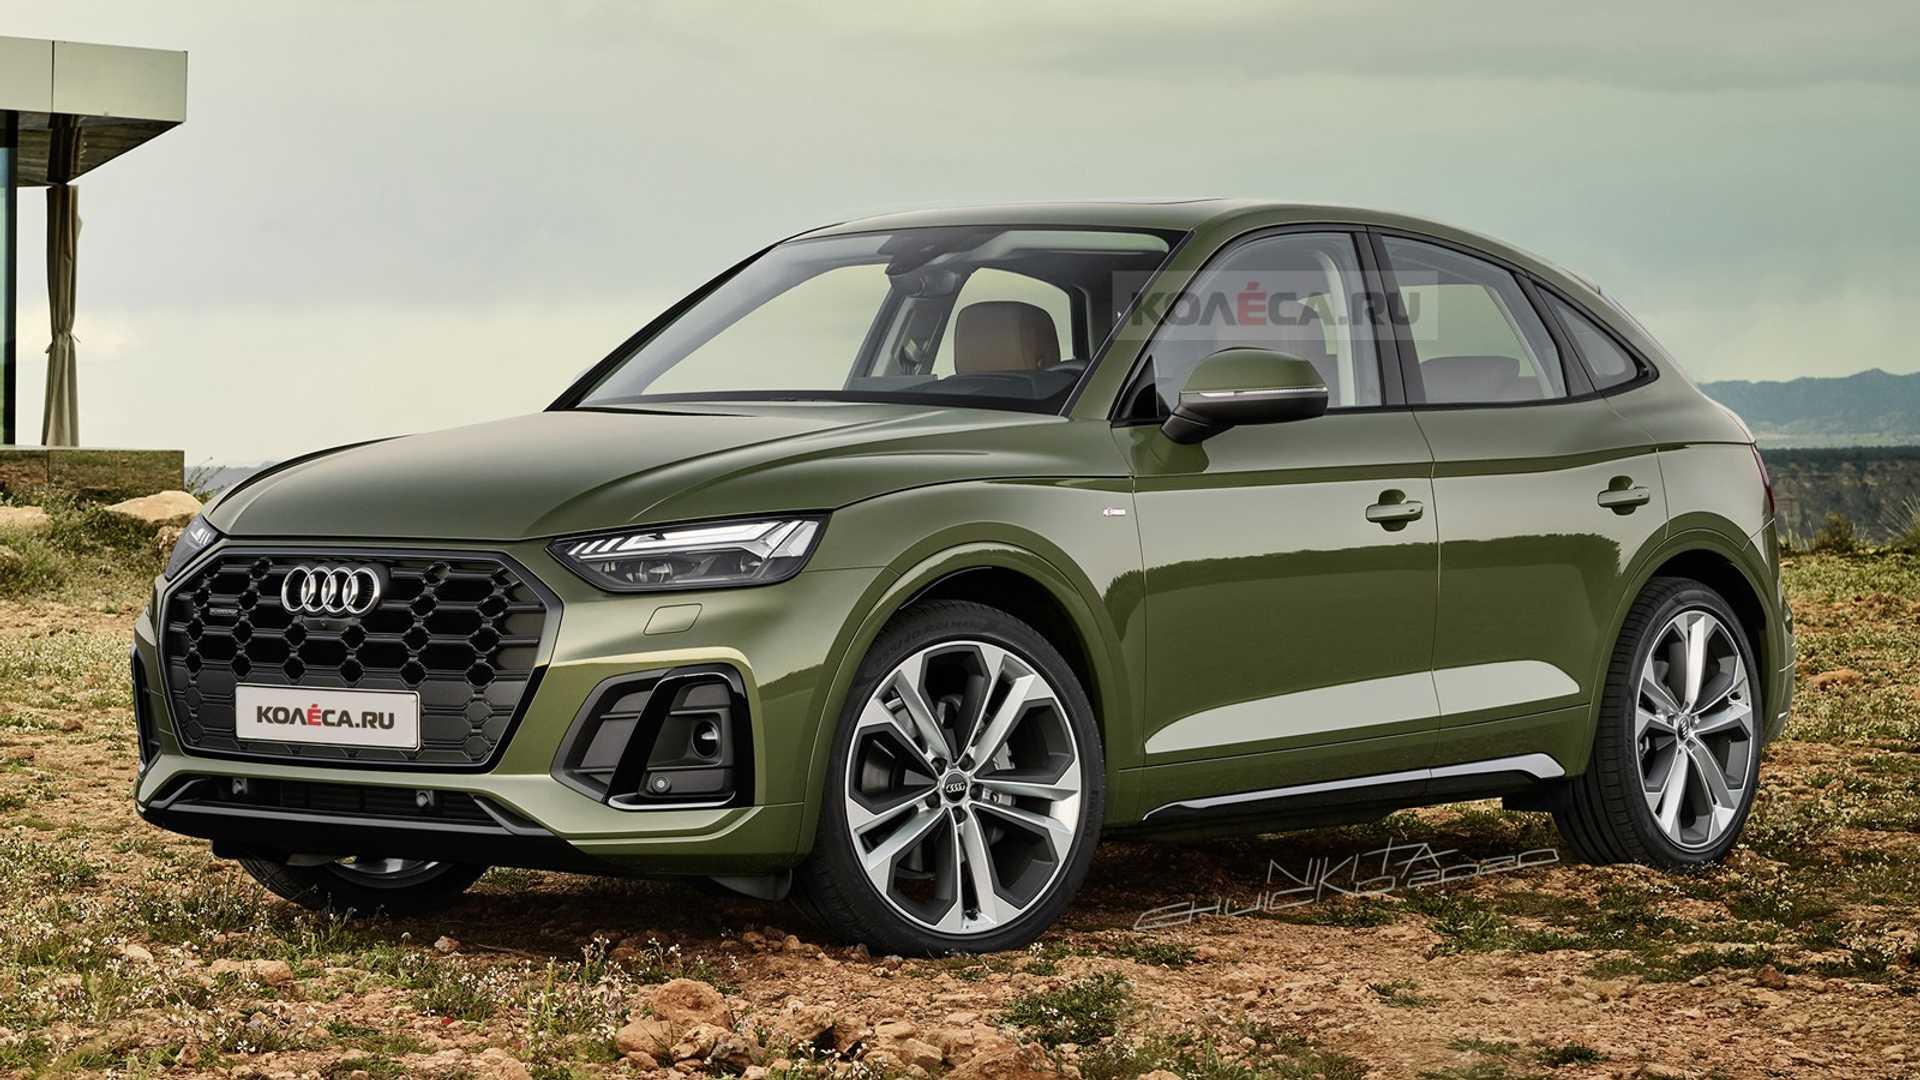 Kelebihan Audi Rs Q5 Top Model Tahun Ini